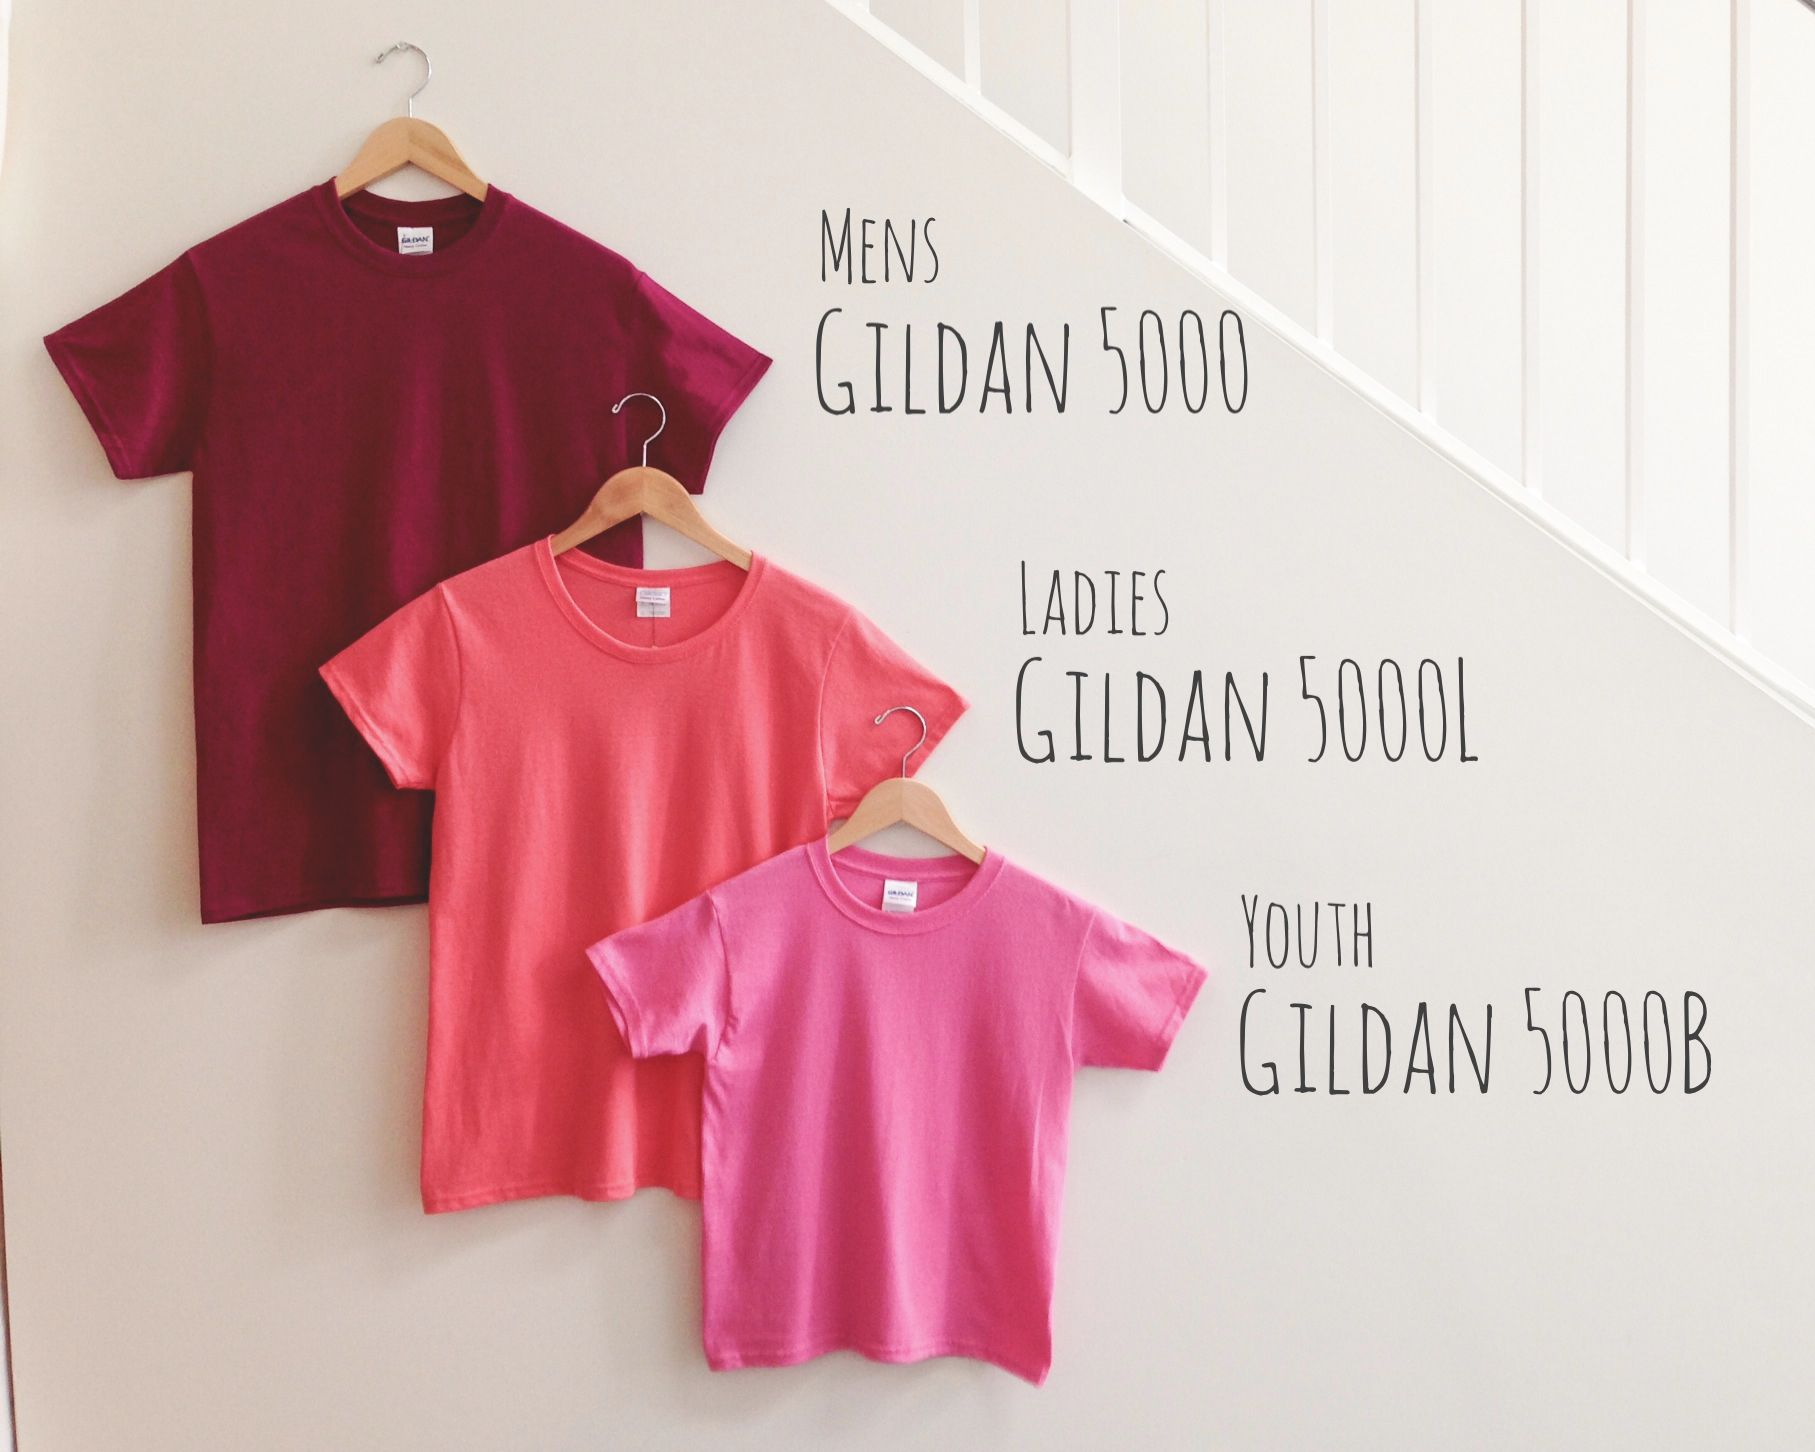 Size Shape Comparison Of The Gildan Heavy Weight Cotton Family Small Gildan 5000 Medium Gildan 5000l Small Gildan 5000b Open Shoulder Tops Gildan Fashion